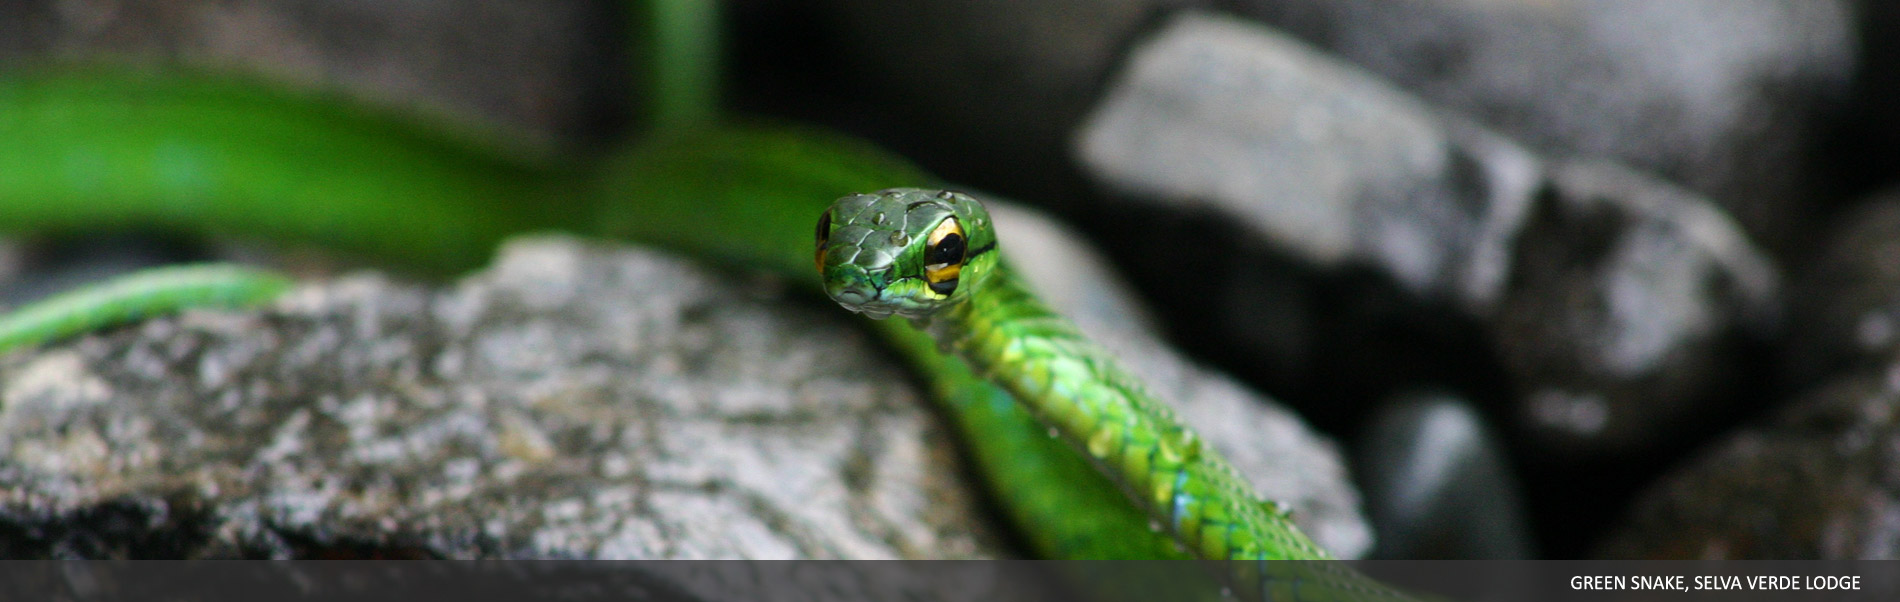 Amphibians-Reptiles-03.jpg